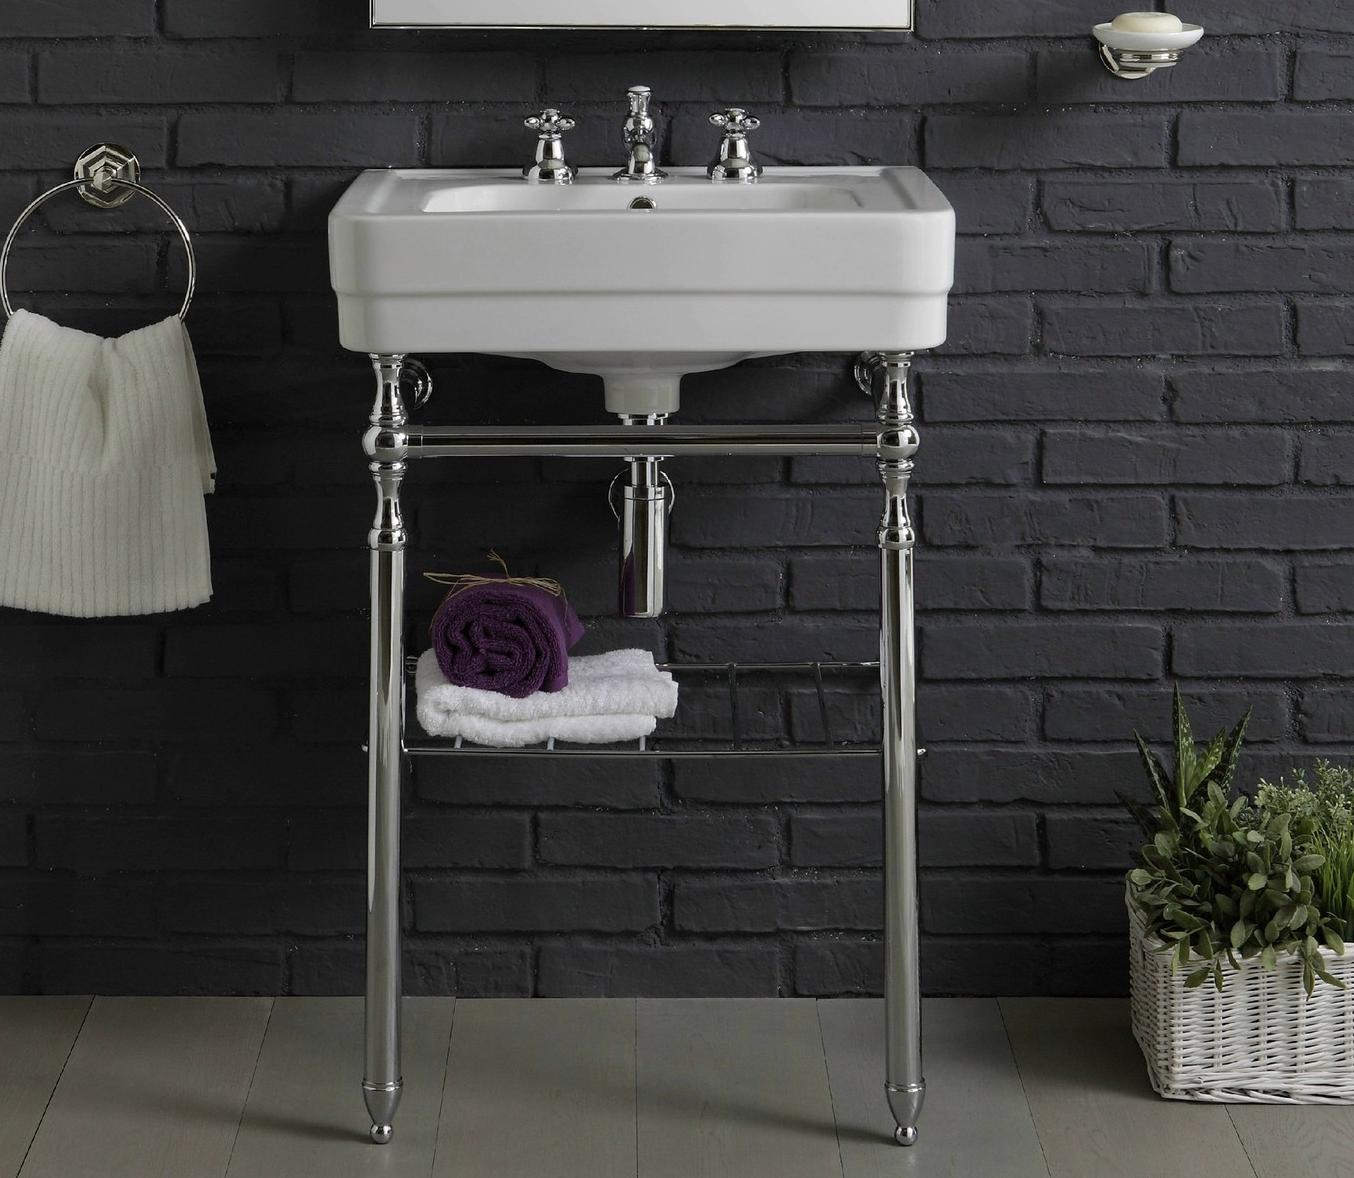 Washbasin In Art Deco Stile On A Metal Frame Affaire D Eau